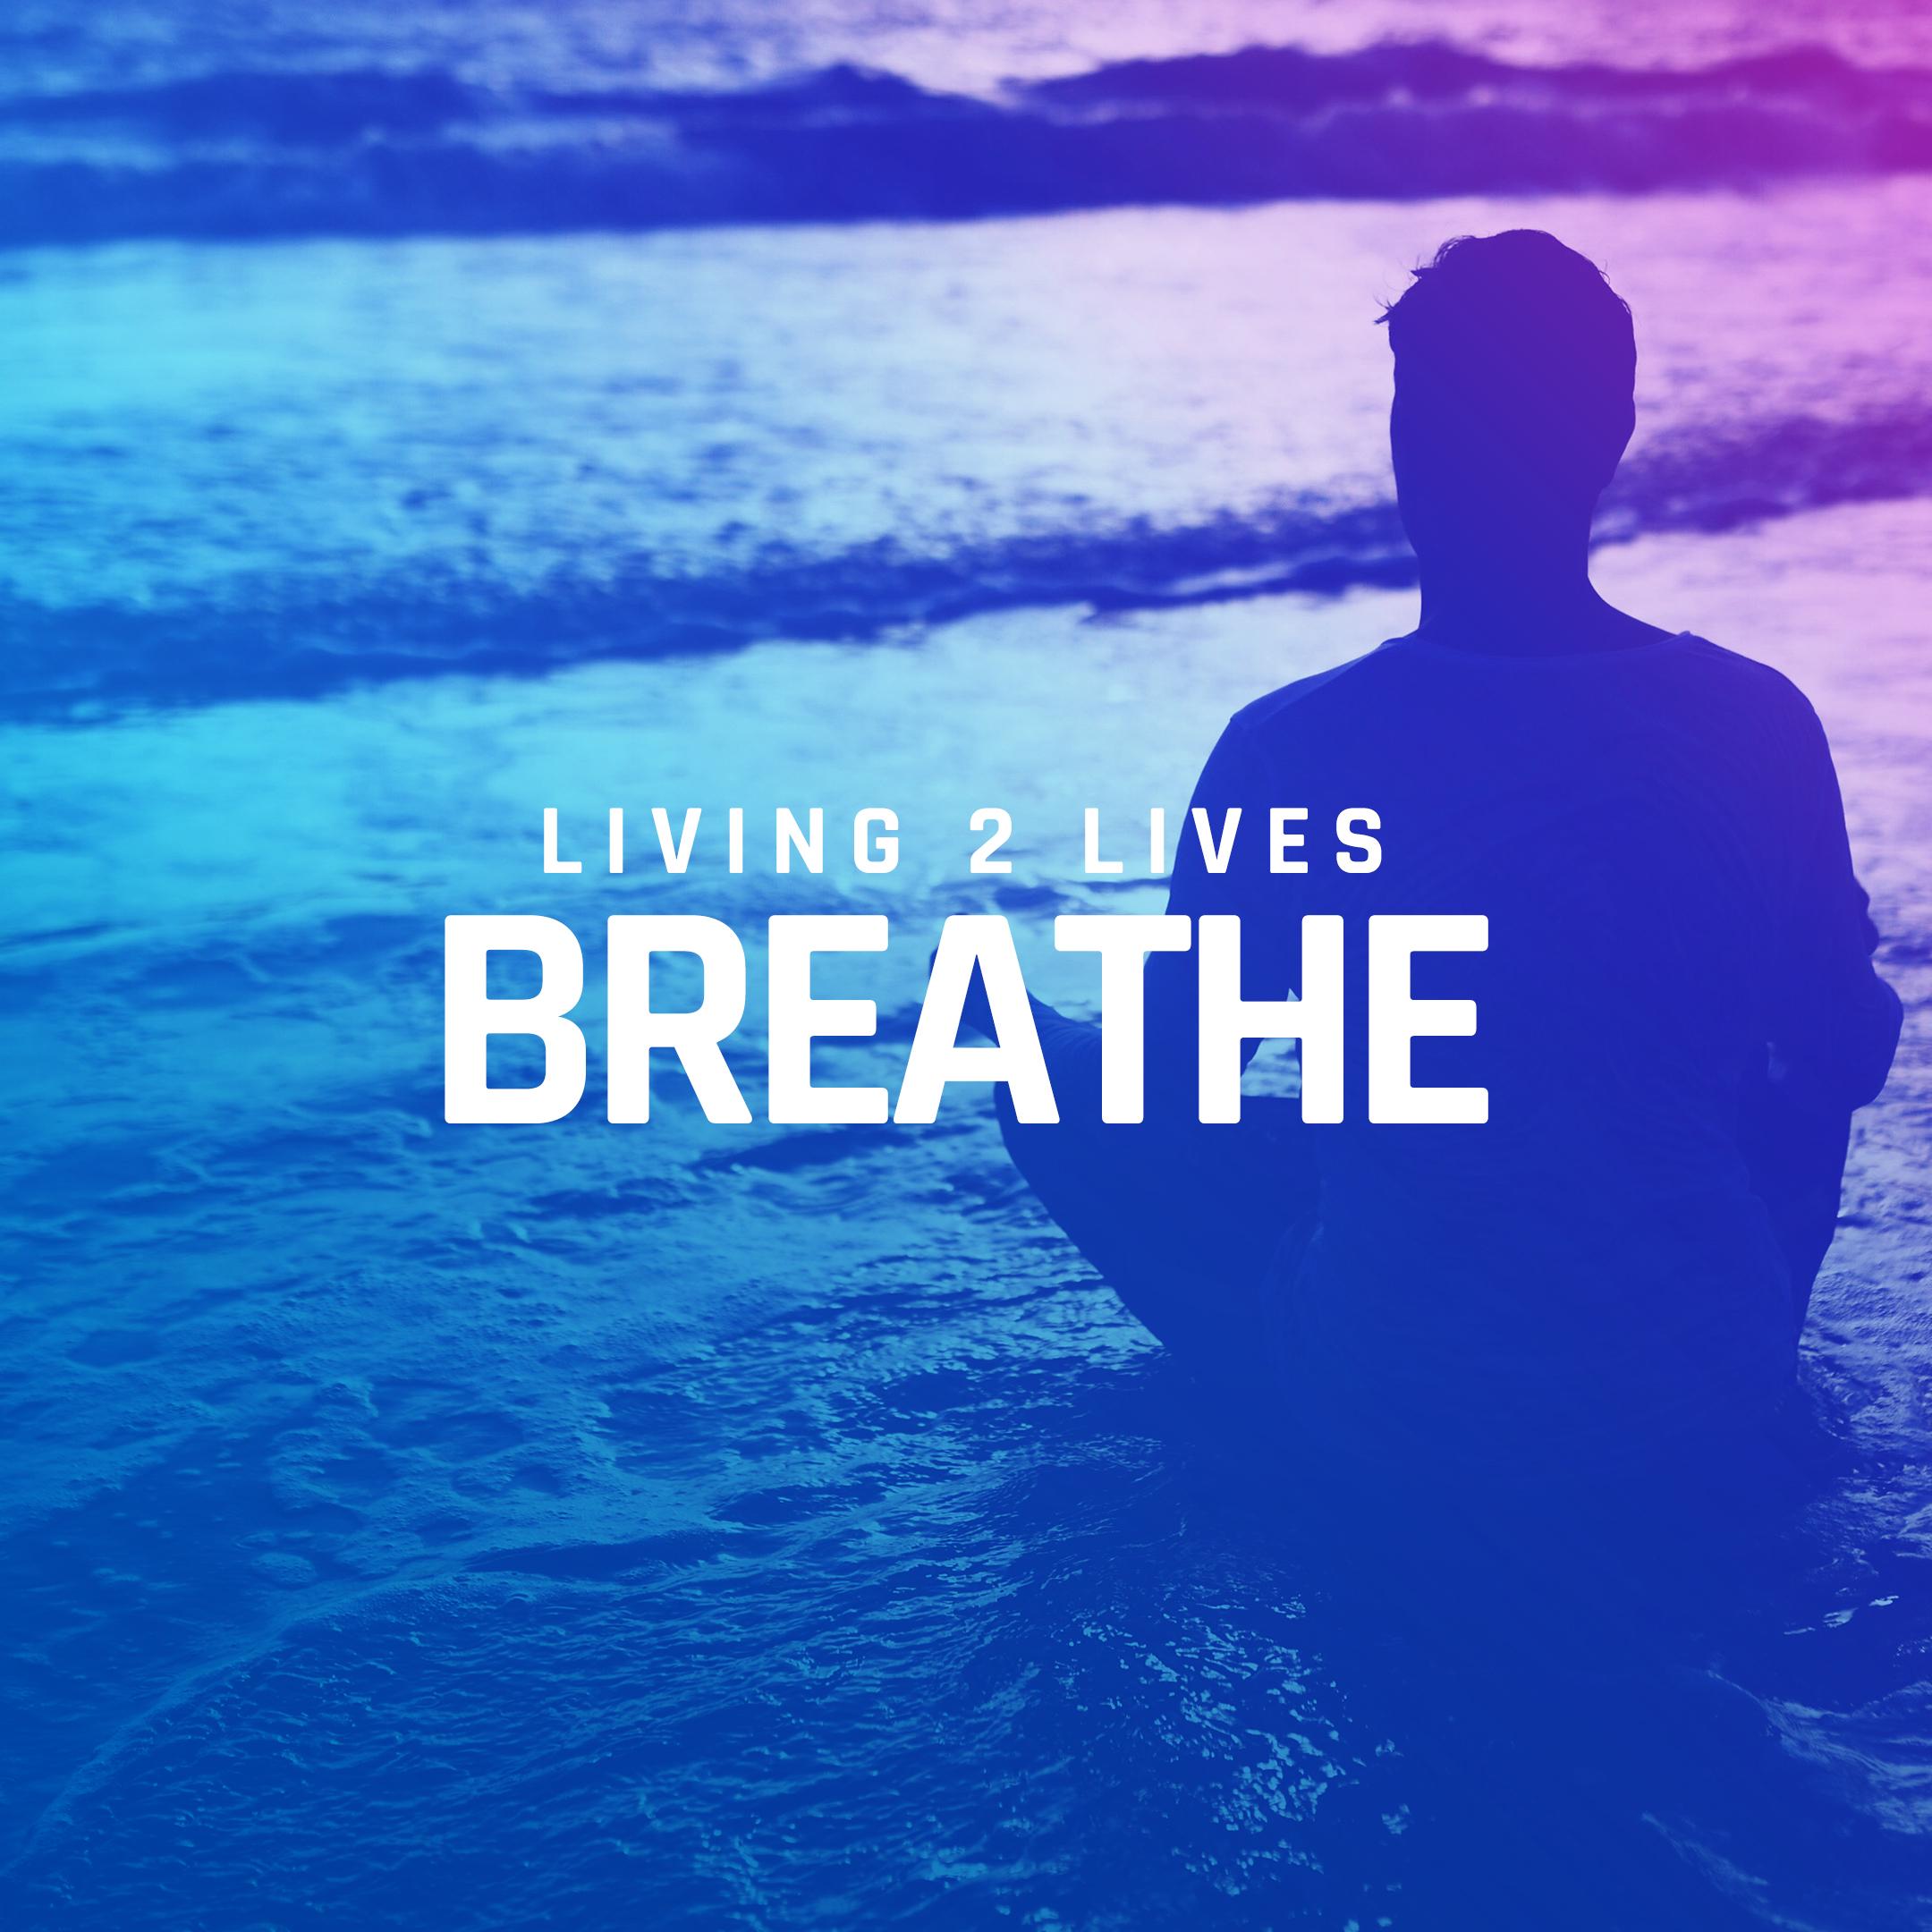 Living 2 Lives